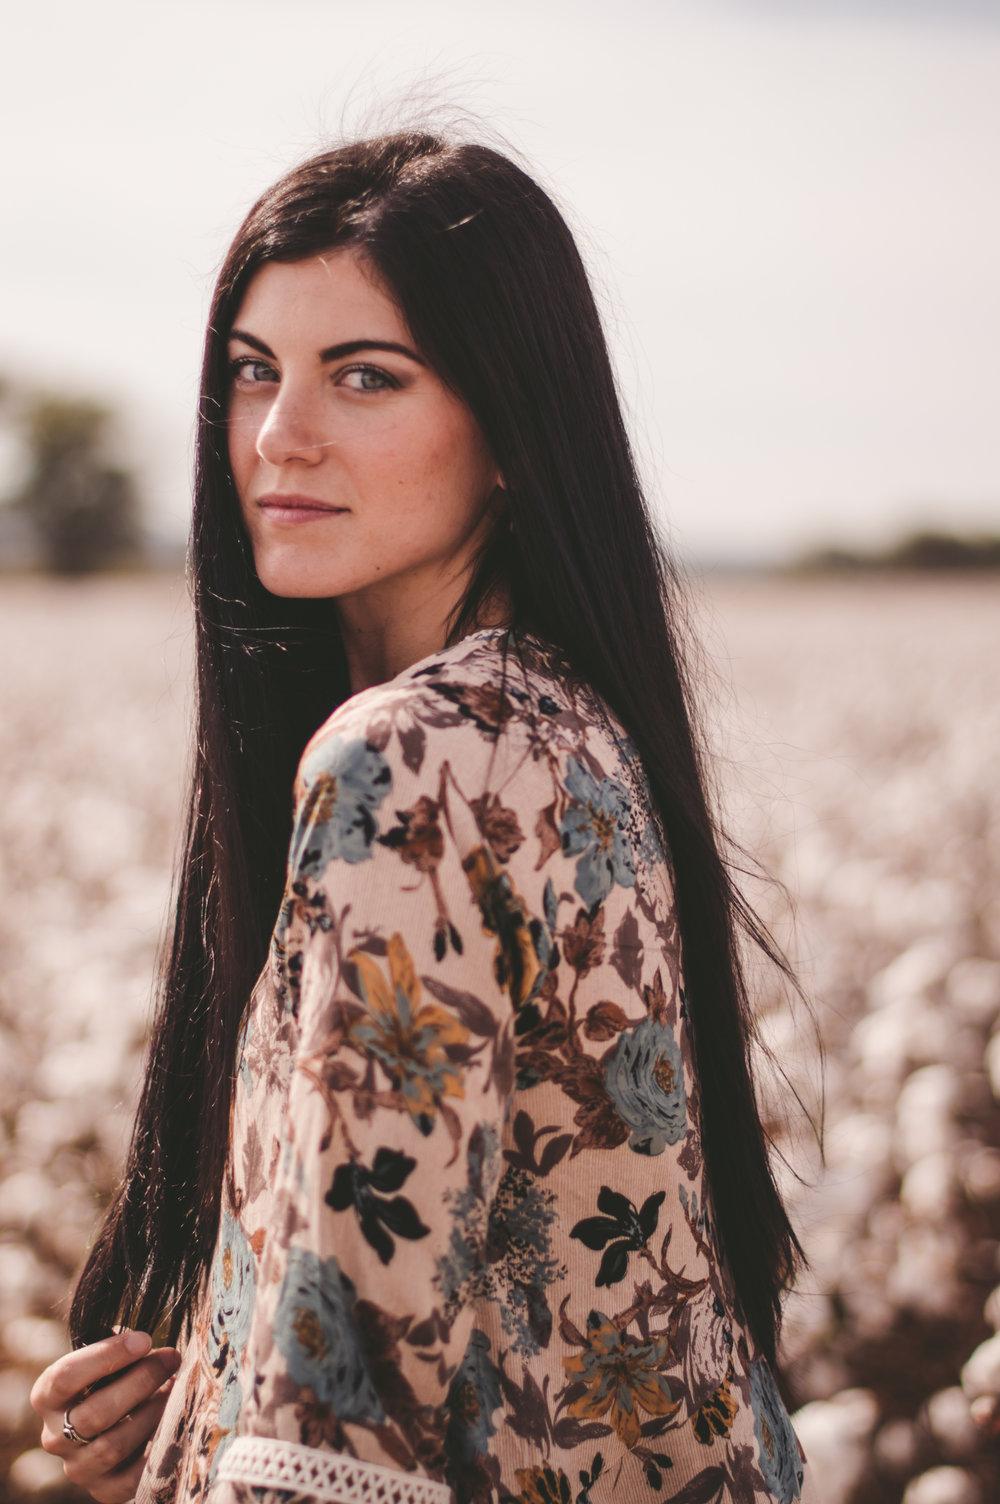 Model: Ericka Faddis